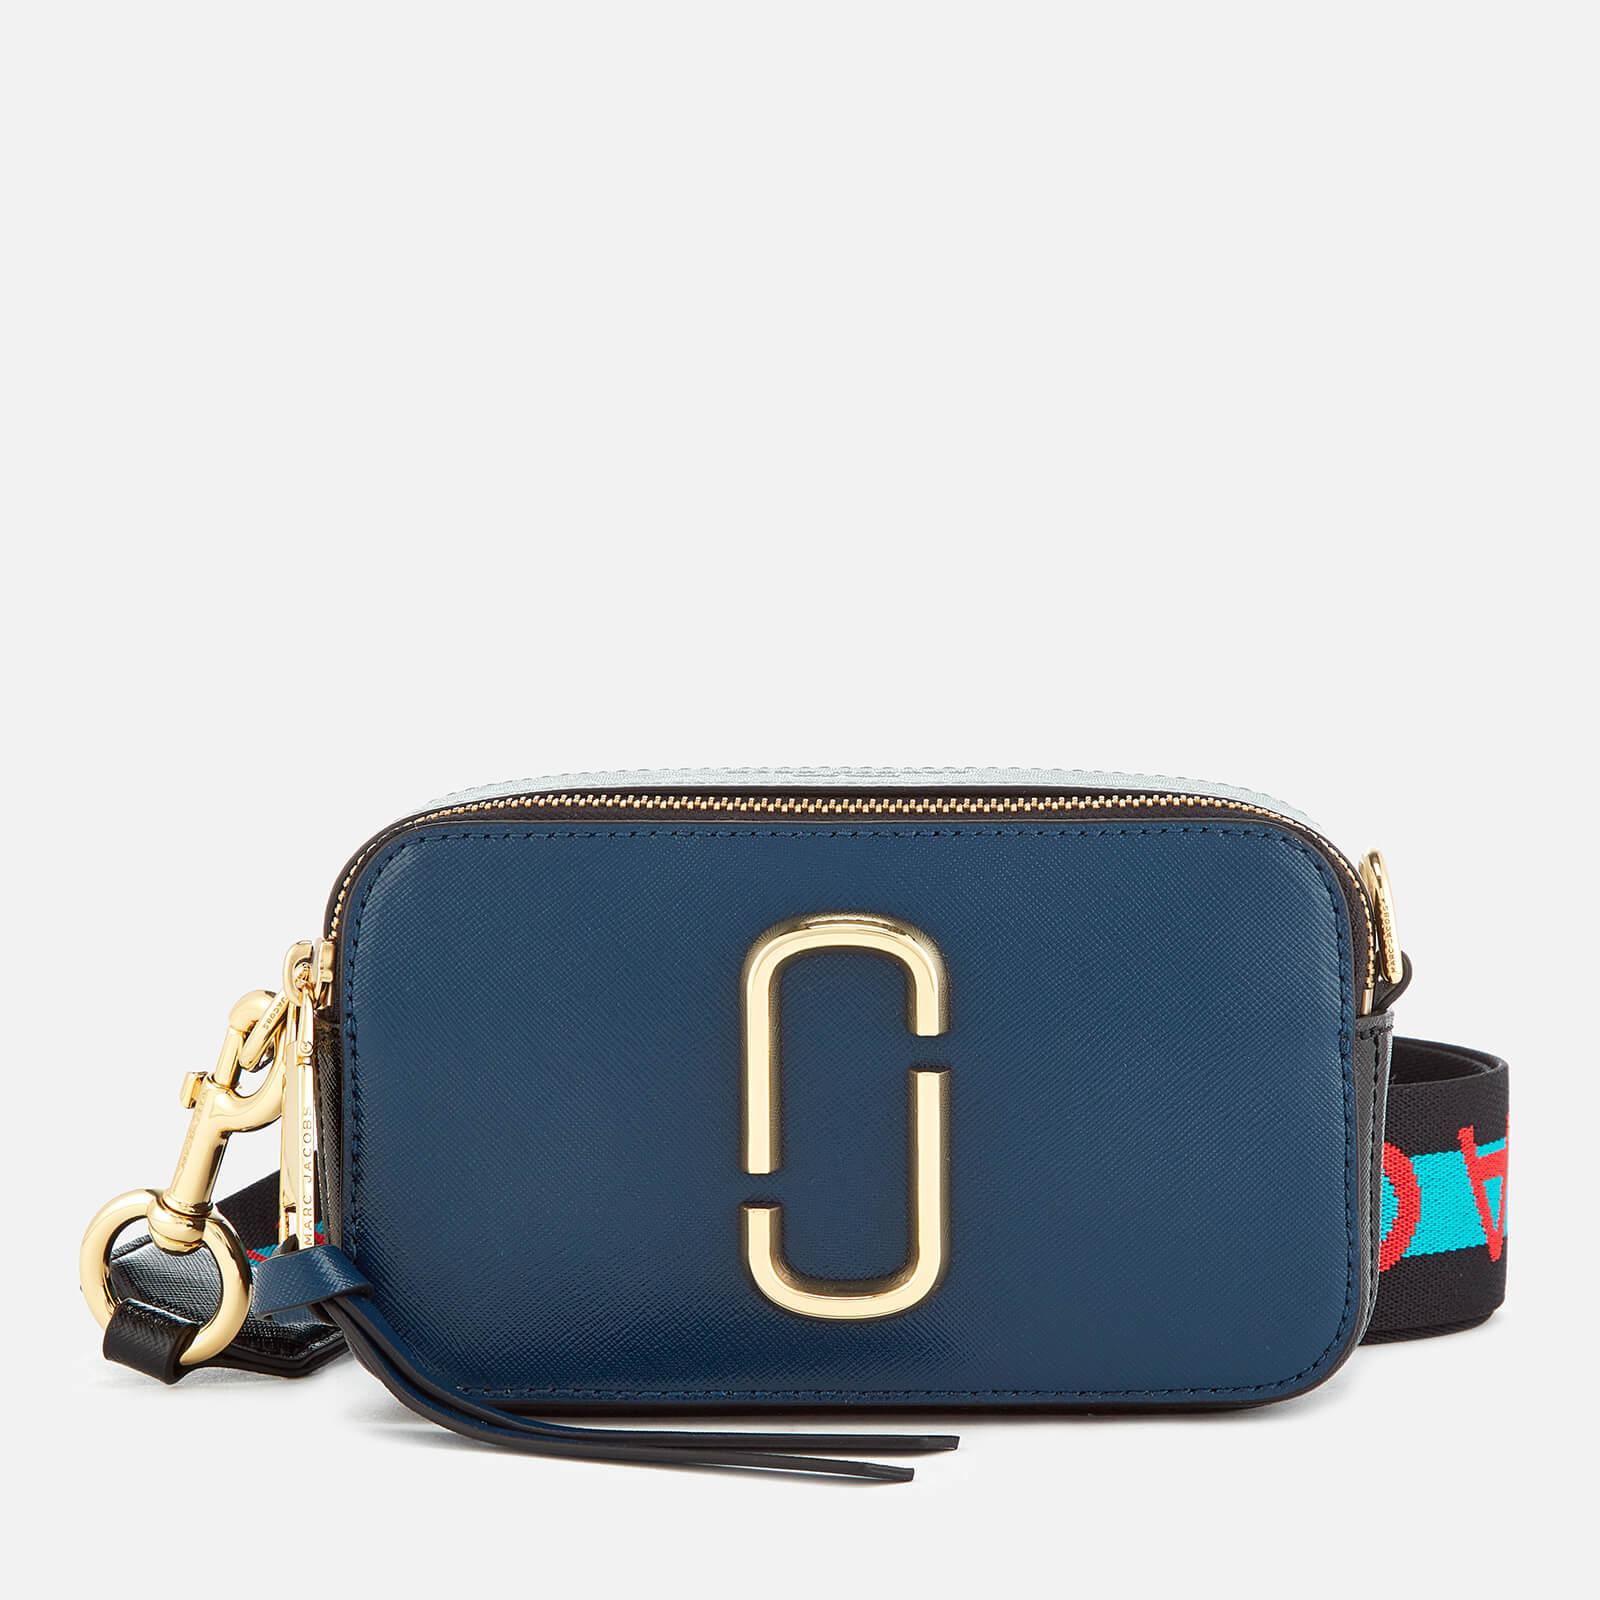 Marc Jacobs Women s Snapshot Cross Body Bag - Blue Sea Multi - Free ... f03bd00d9844e